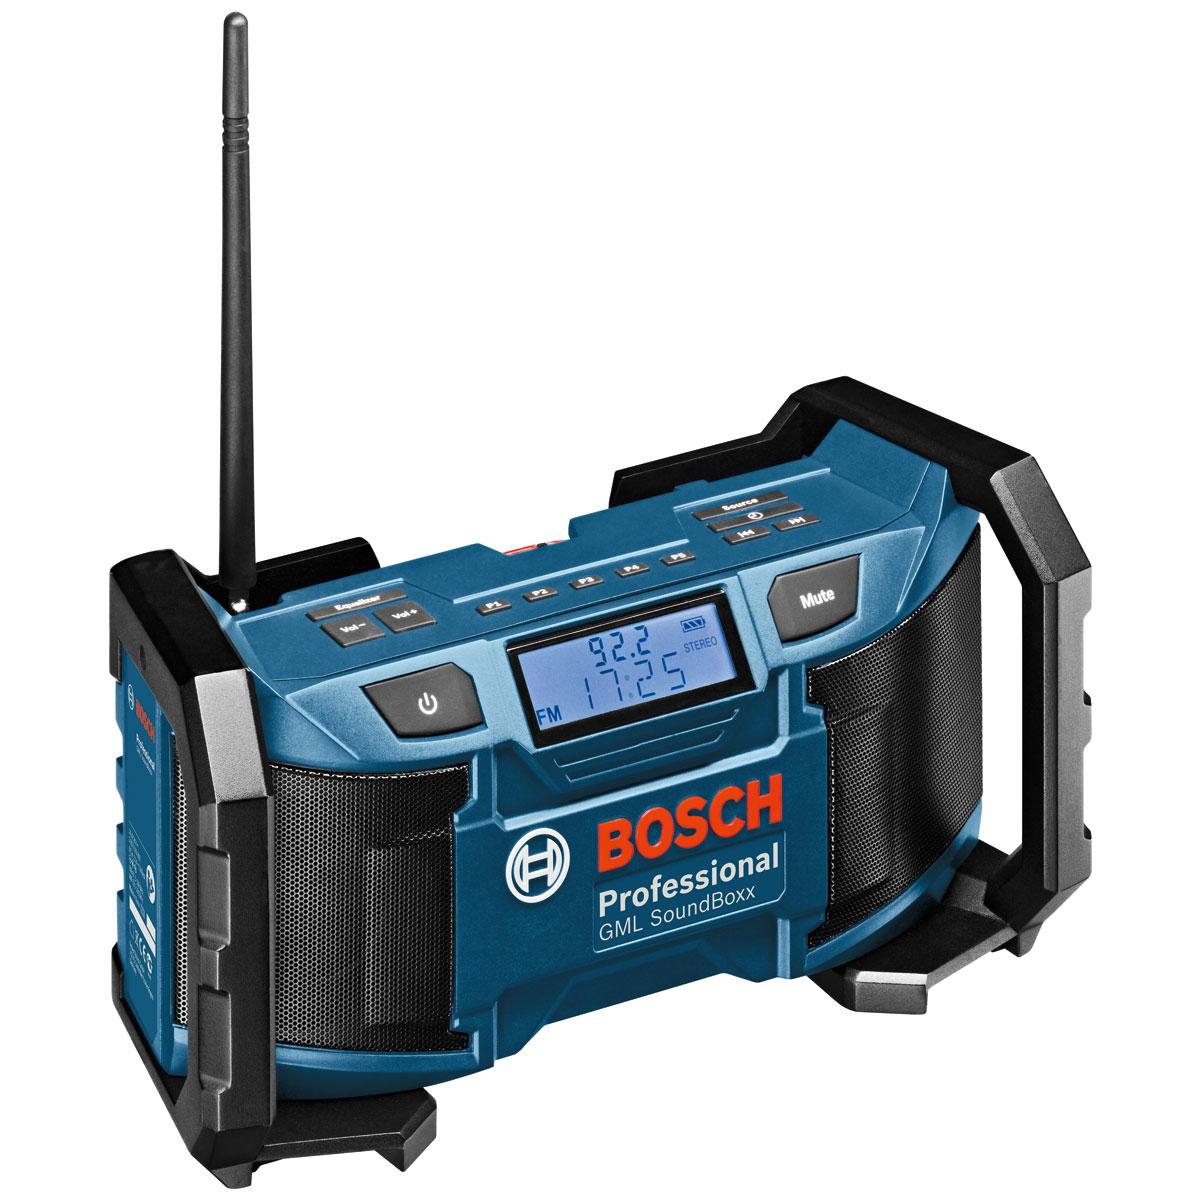 Радио Bosch Gml soundboxx (0.601.429.900) радиоприемник bosch gml 14 4 18 v sound boxx 0 601 429 900